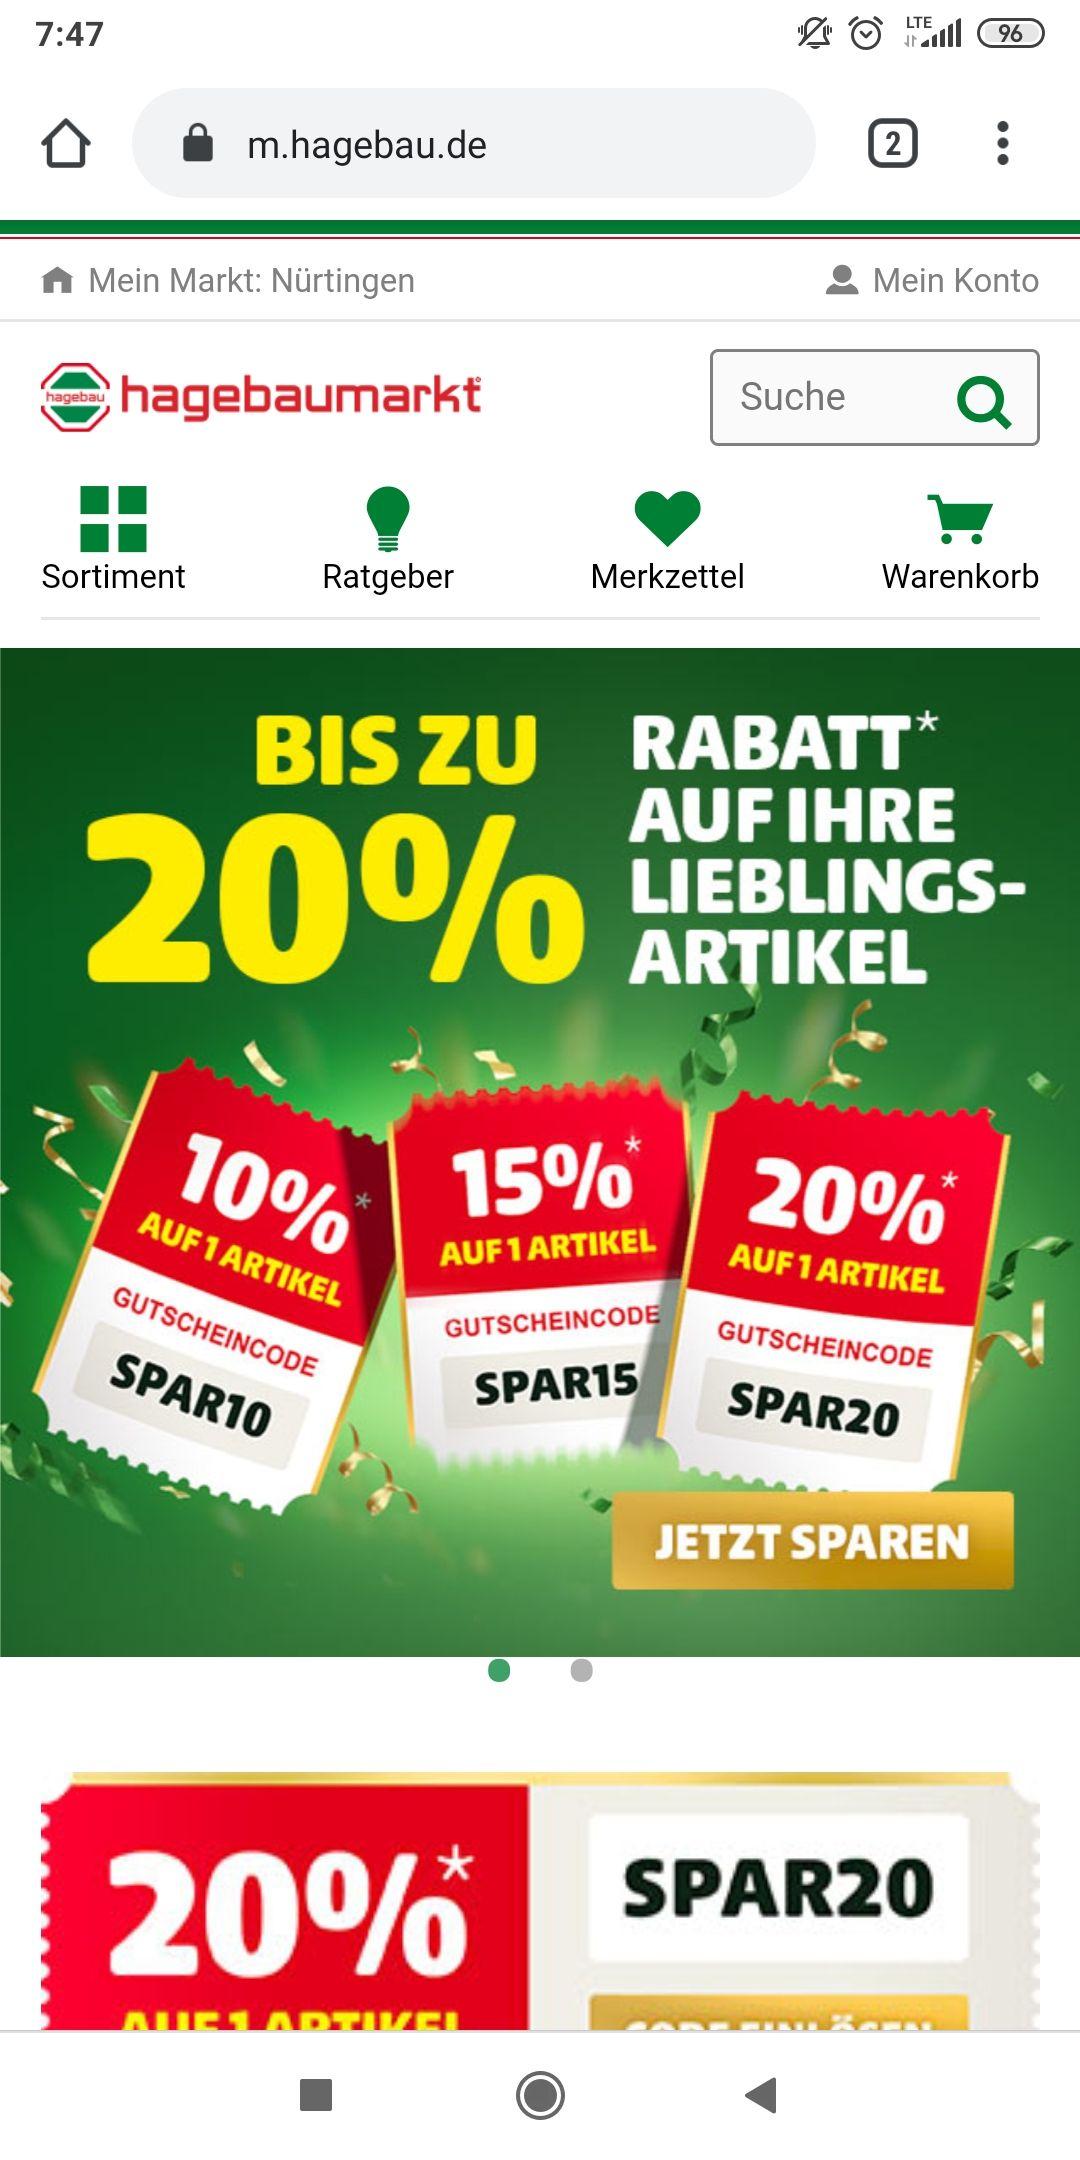 Hagebaumarkt online bis 20%